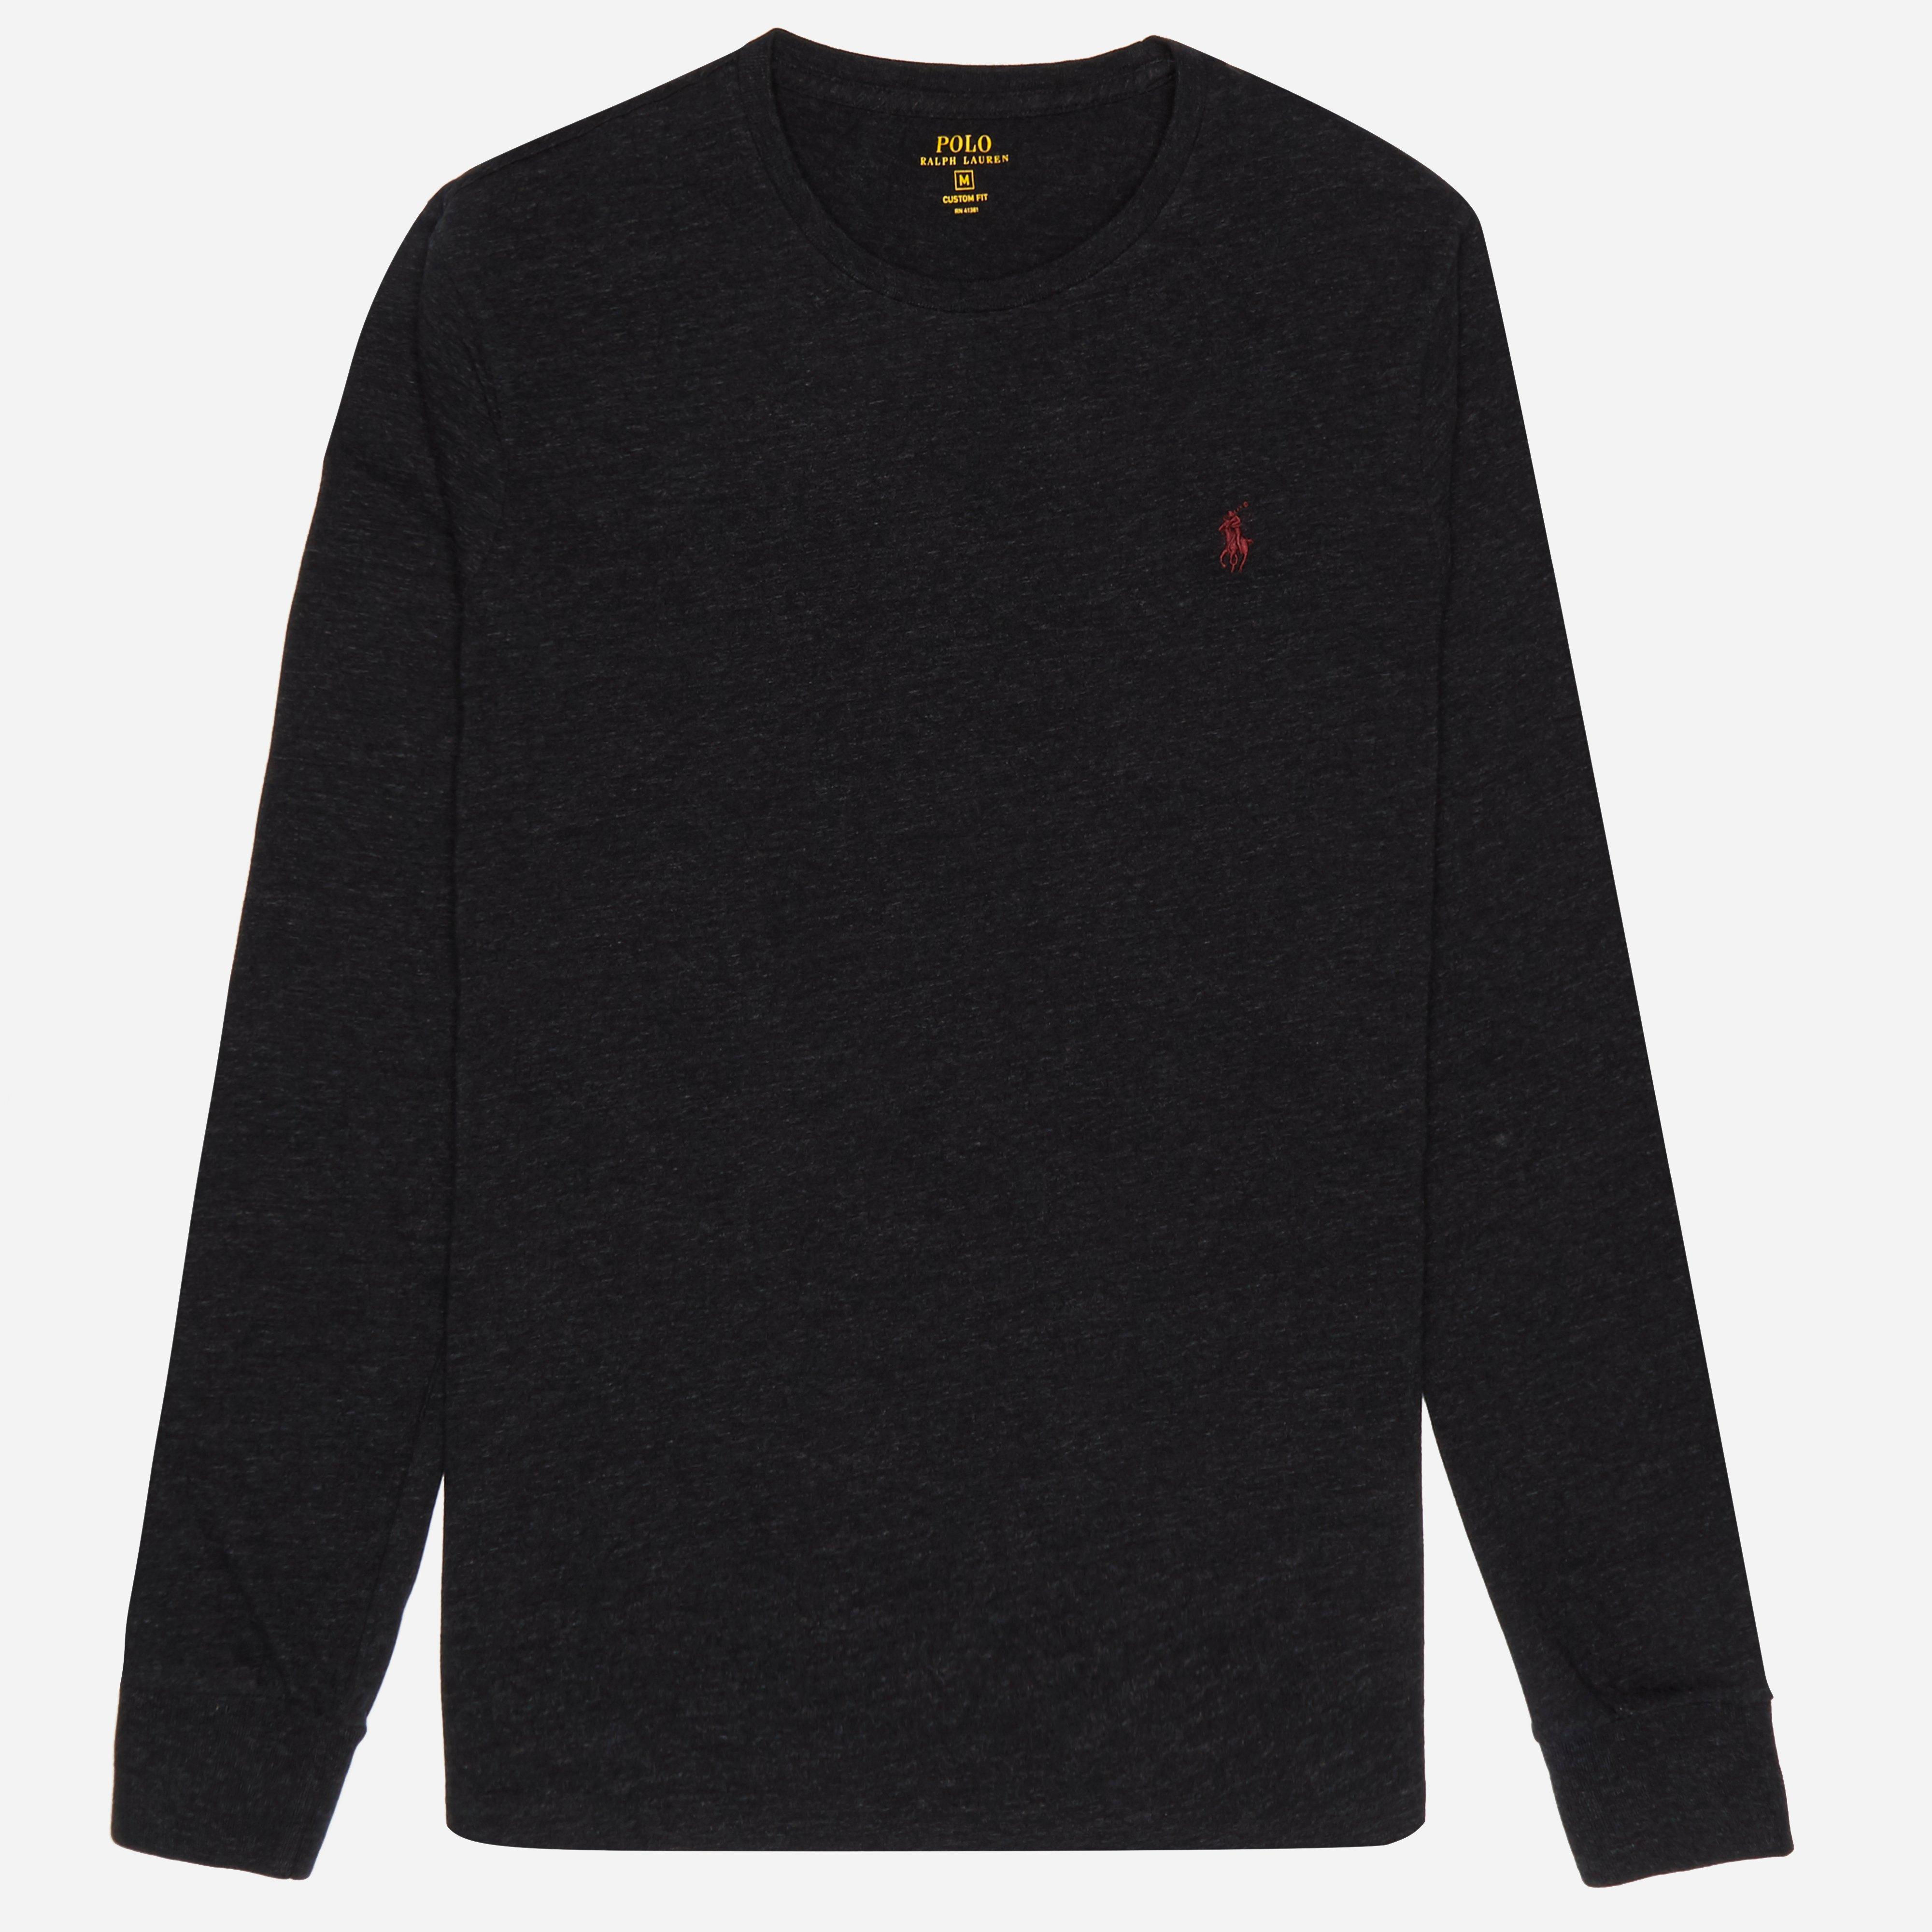 Polo Ralph Lauren Long Sleeved Custom T-shirt